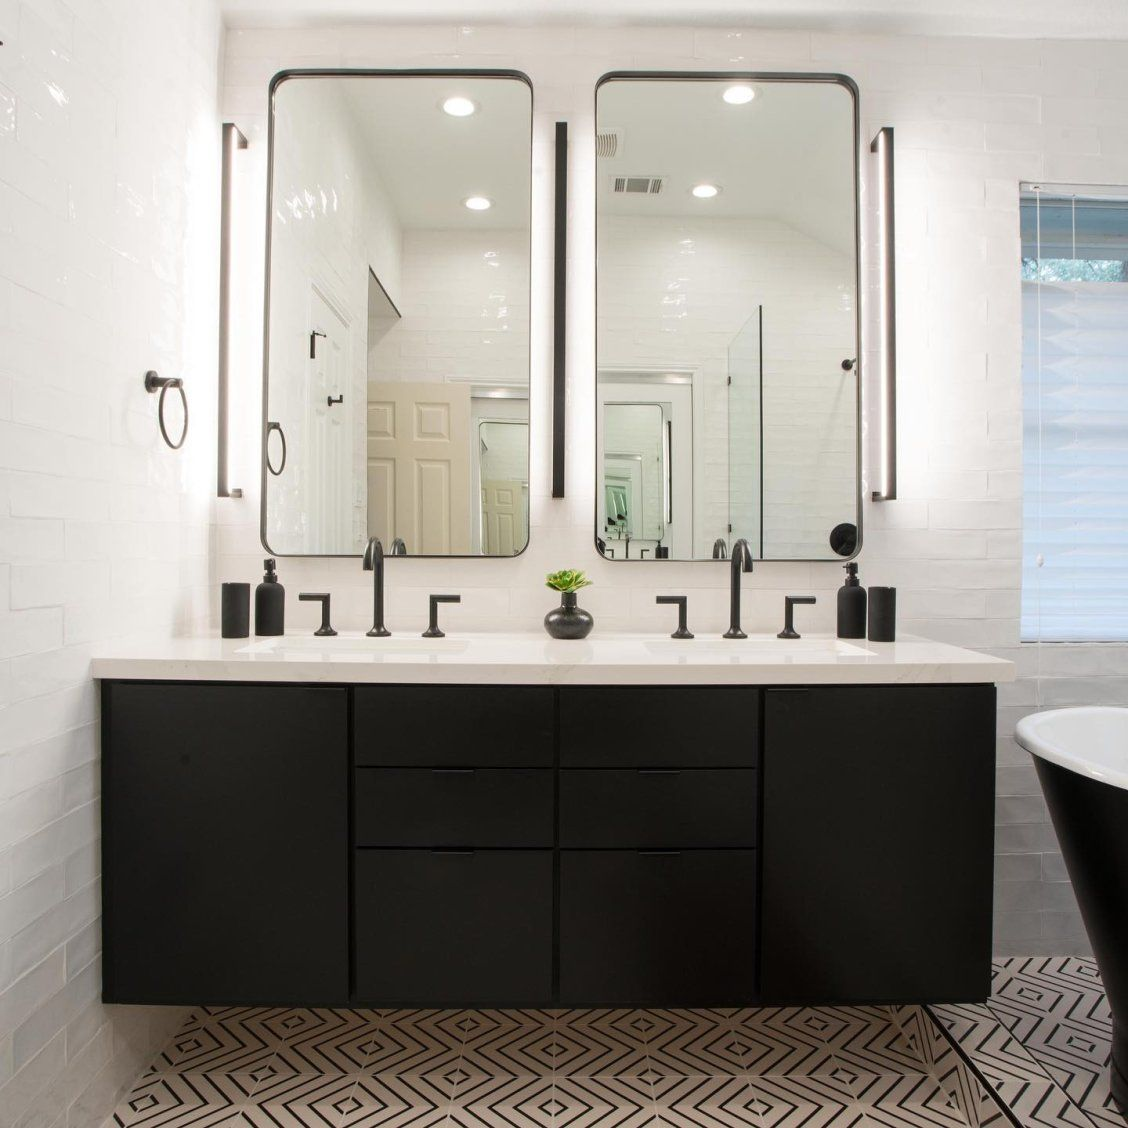 Thin Line Led Wall Bar Master Bathroom Vanity Bathroom Design Bathroom Remodel Master